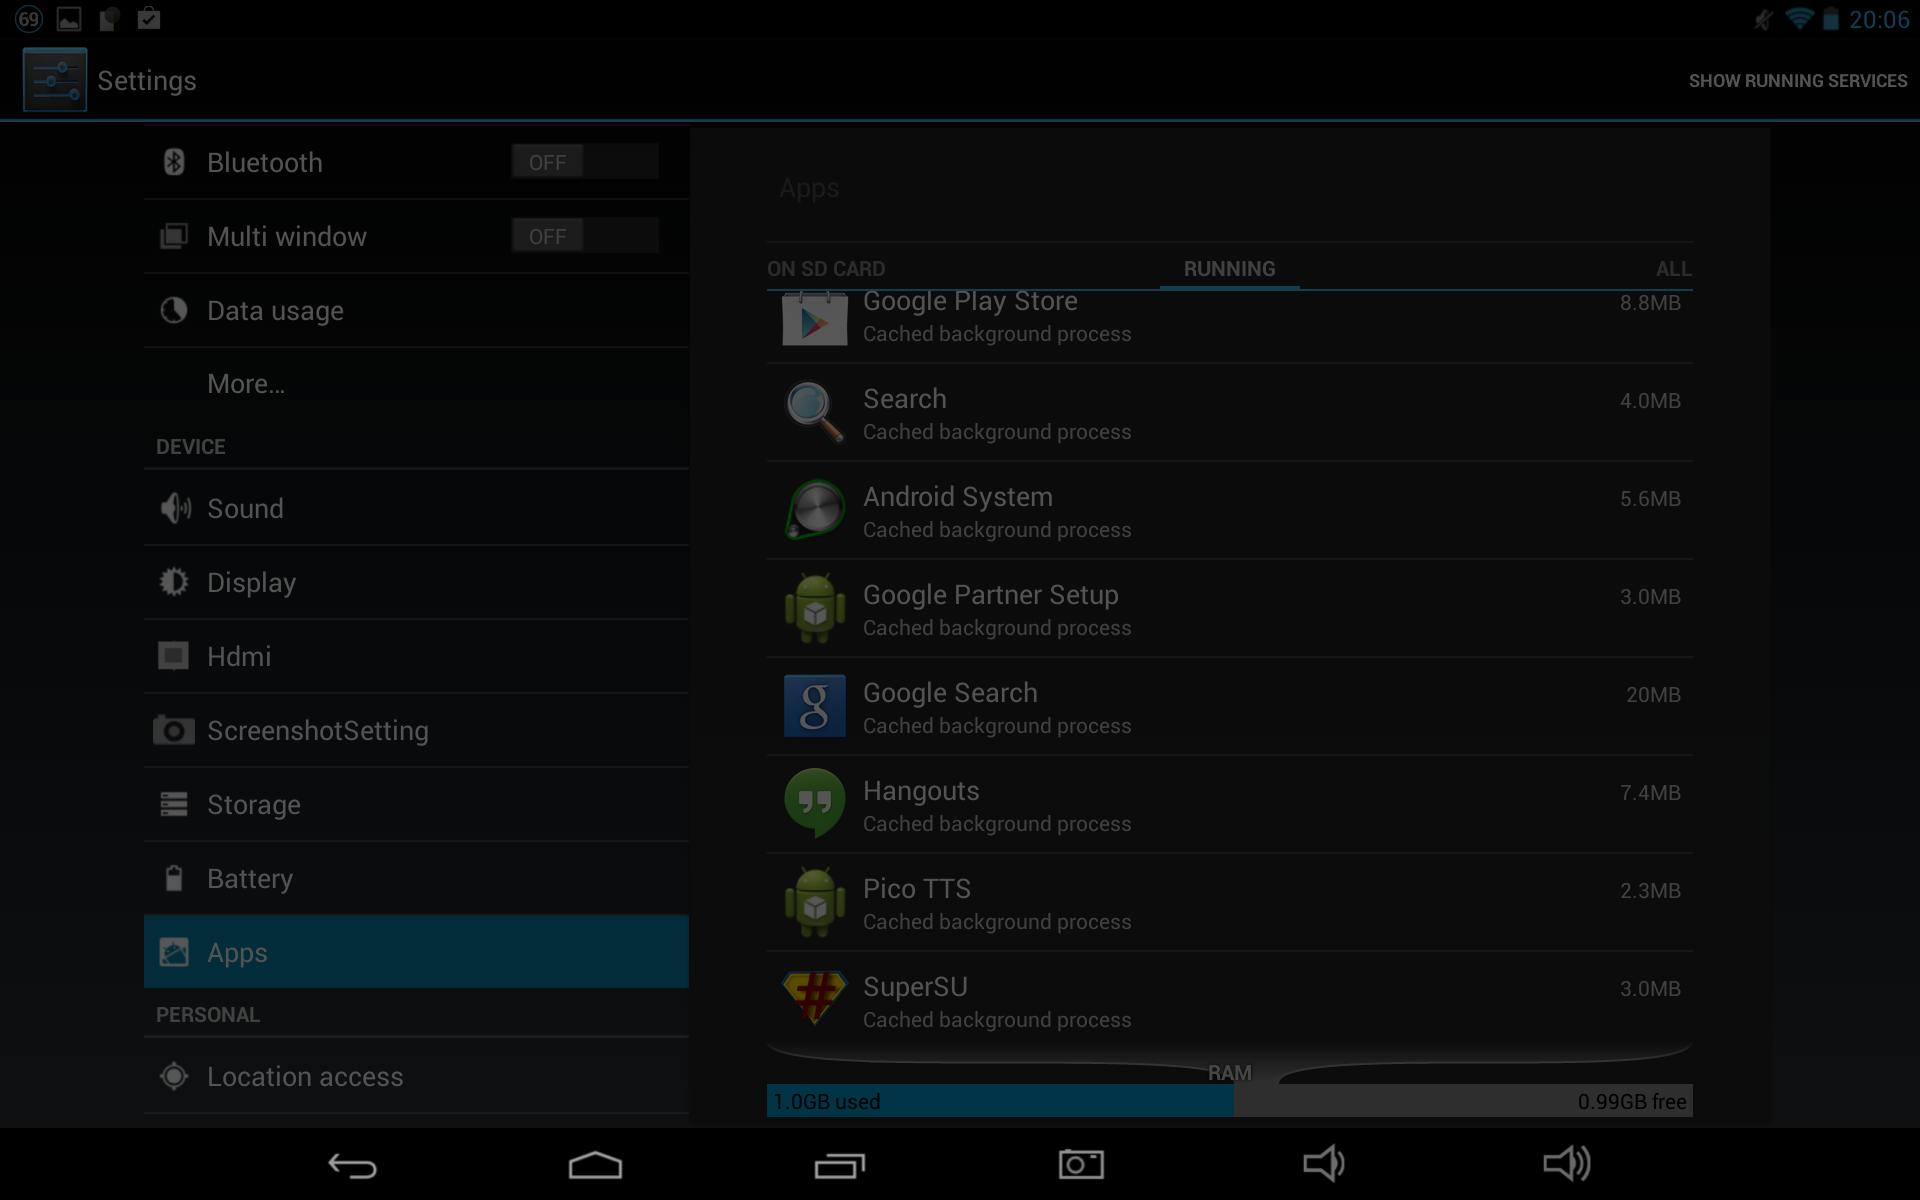 Screenshot_2013-10-08-20-06-17.png